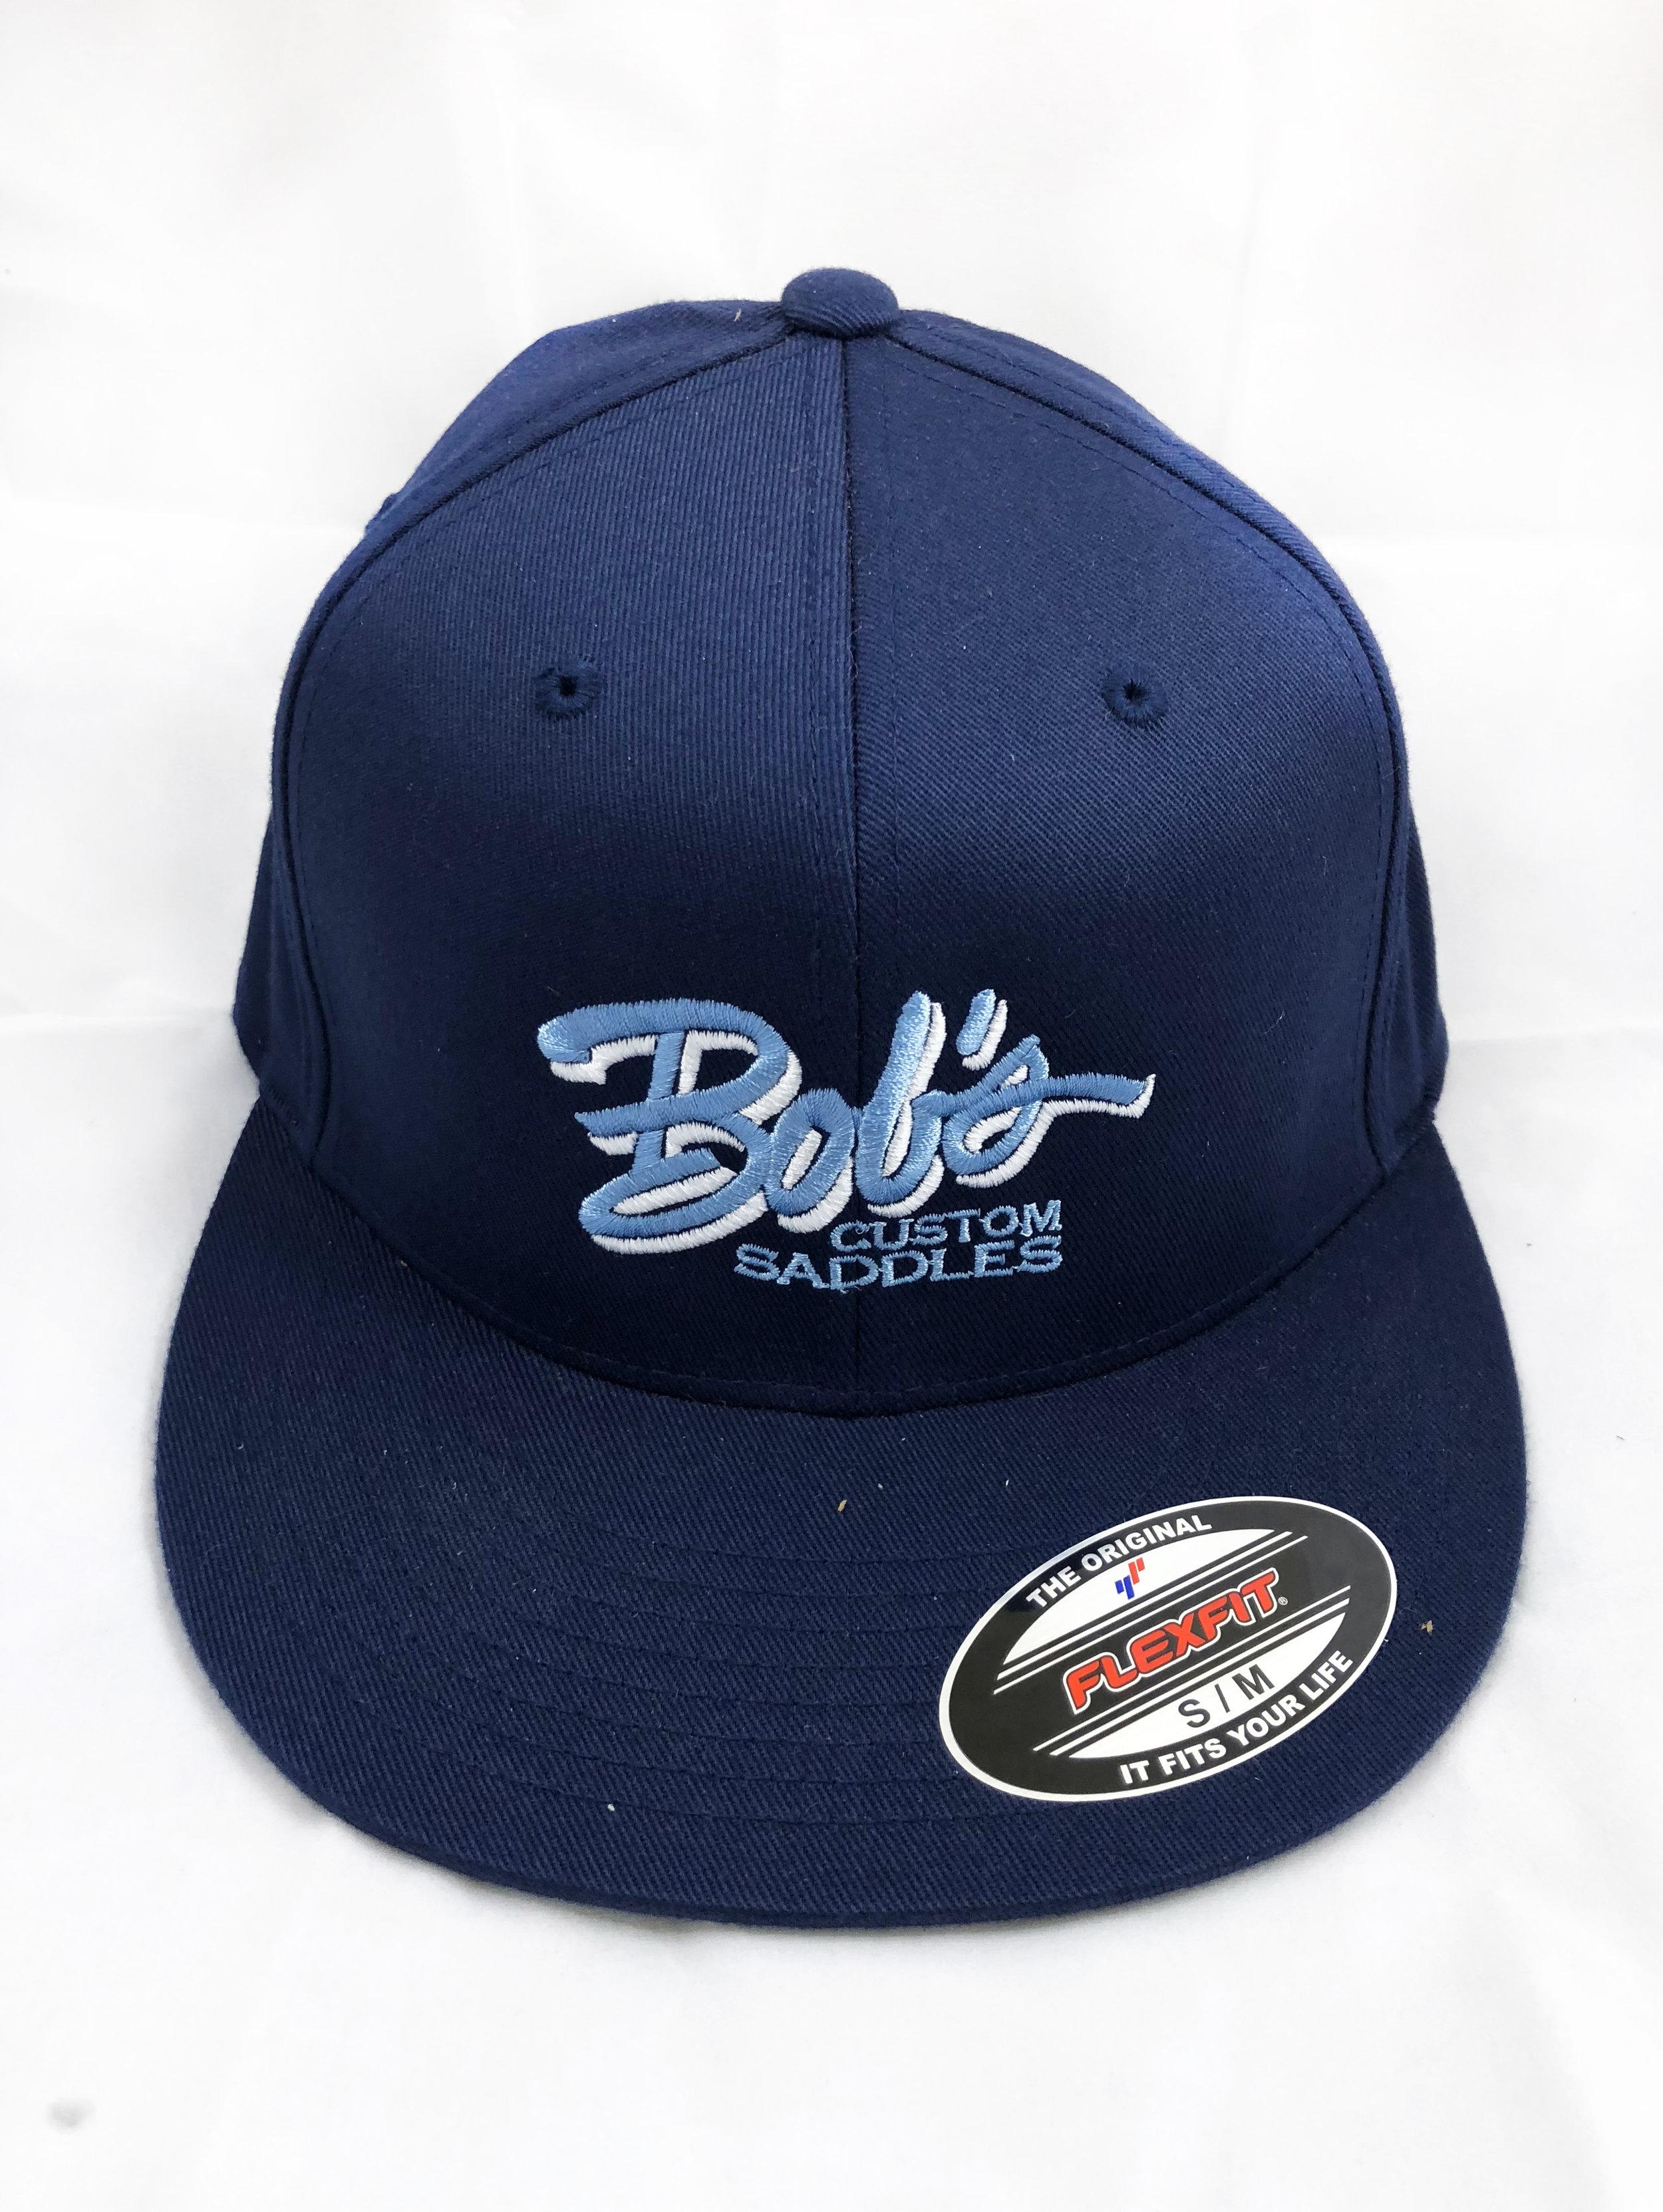 876ed7d9e7d ... usa hats the largest selection of streetwear hats zumiez f2d9d b1b15